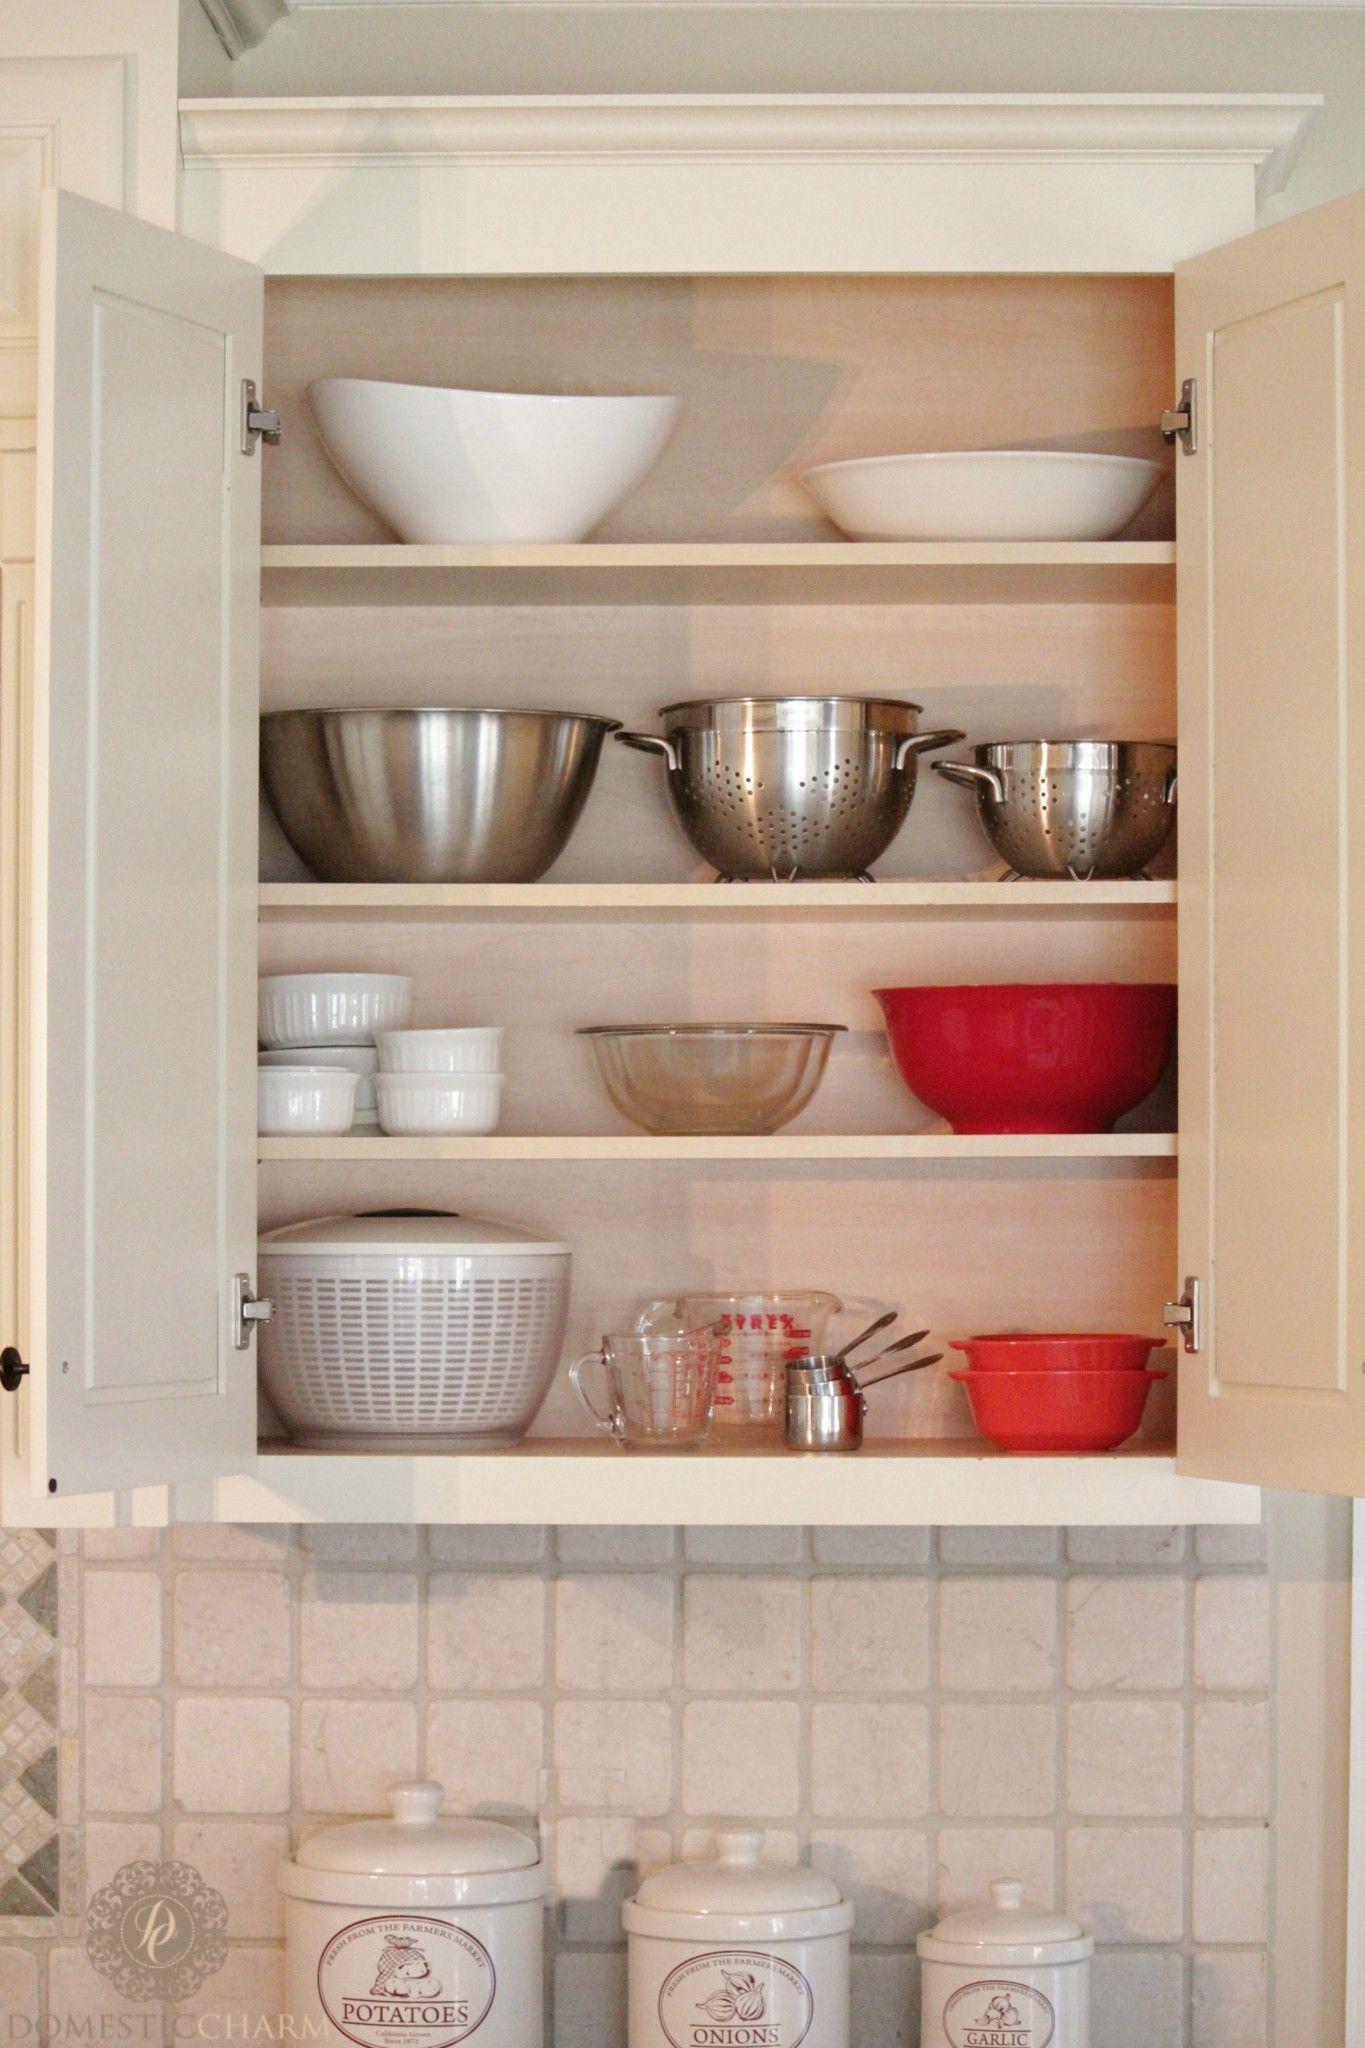 organizing your kitchen cabinets kitchen furniture storage kitchen cabinet design kitchen on kitchen decor organization id=80289